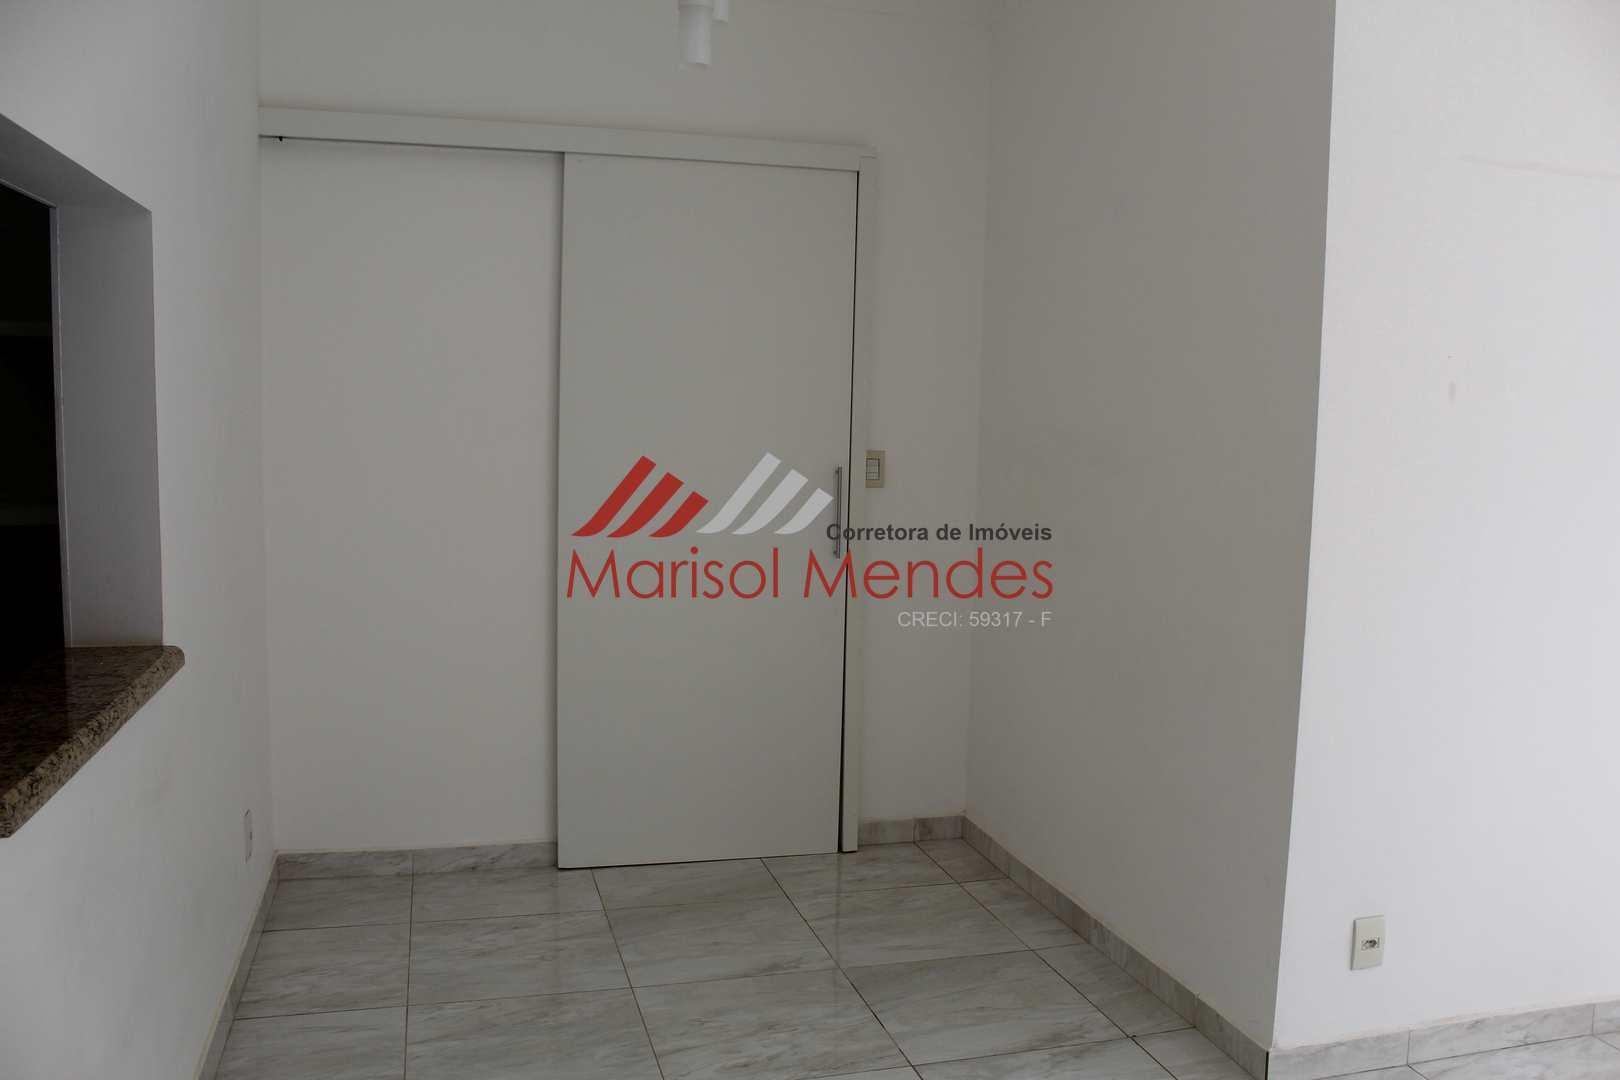 Apartamento com 3 dorms, Jardim Carlos Gomes, Pirassununga - R$ 350 mil, Cod: 112